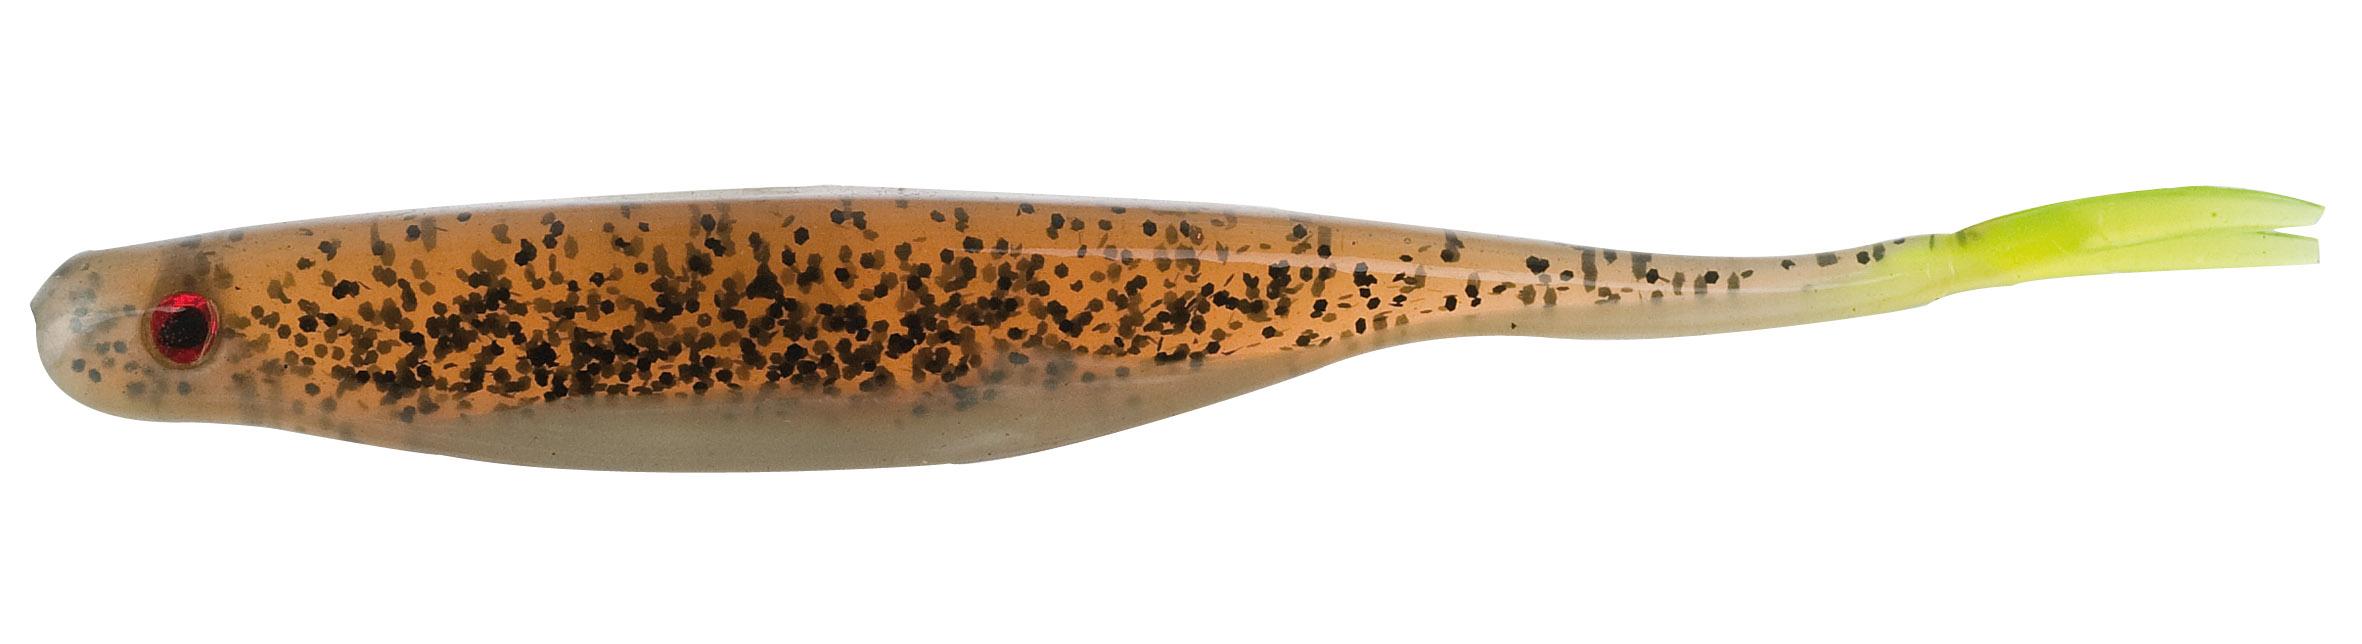 Iron Claw gumová nástraha Premium Split Tail 10 cm Vzor BP, 4ks/bal